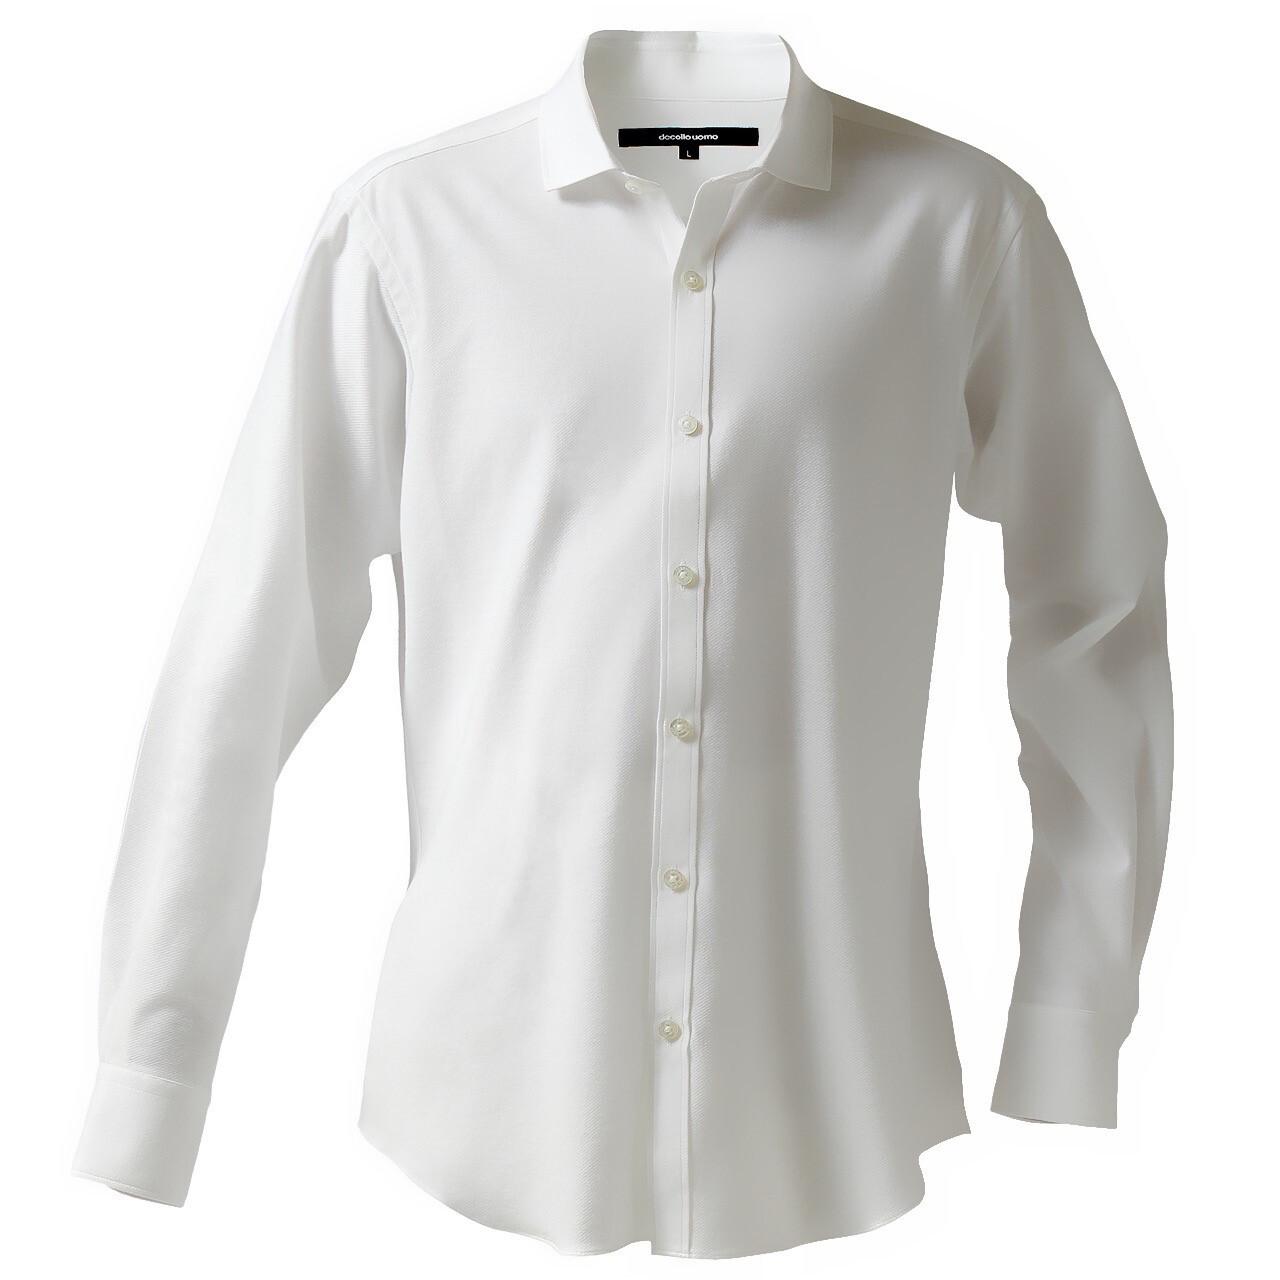 DJS-767 decollouomo メンズドレスシャツ 長袖 overture - ピュアホワイト